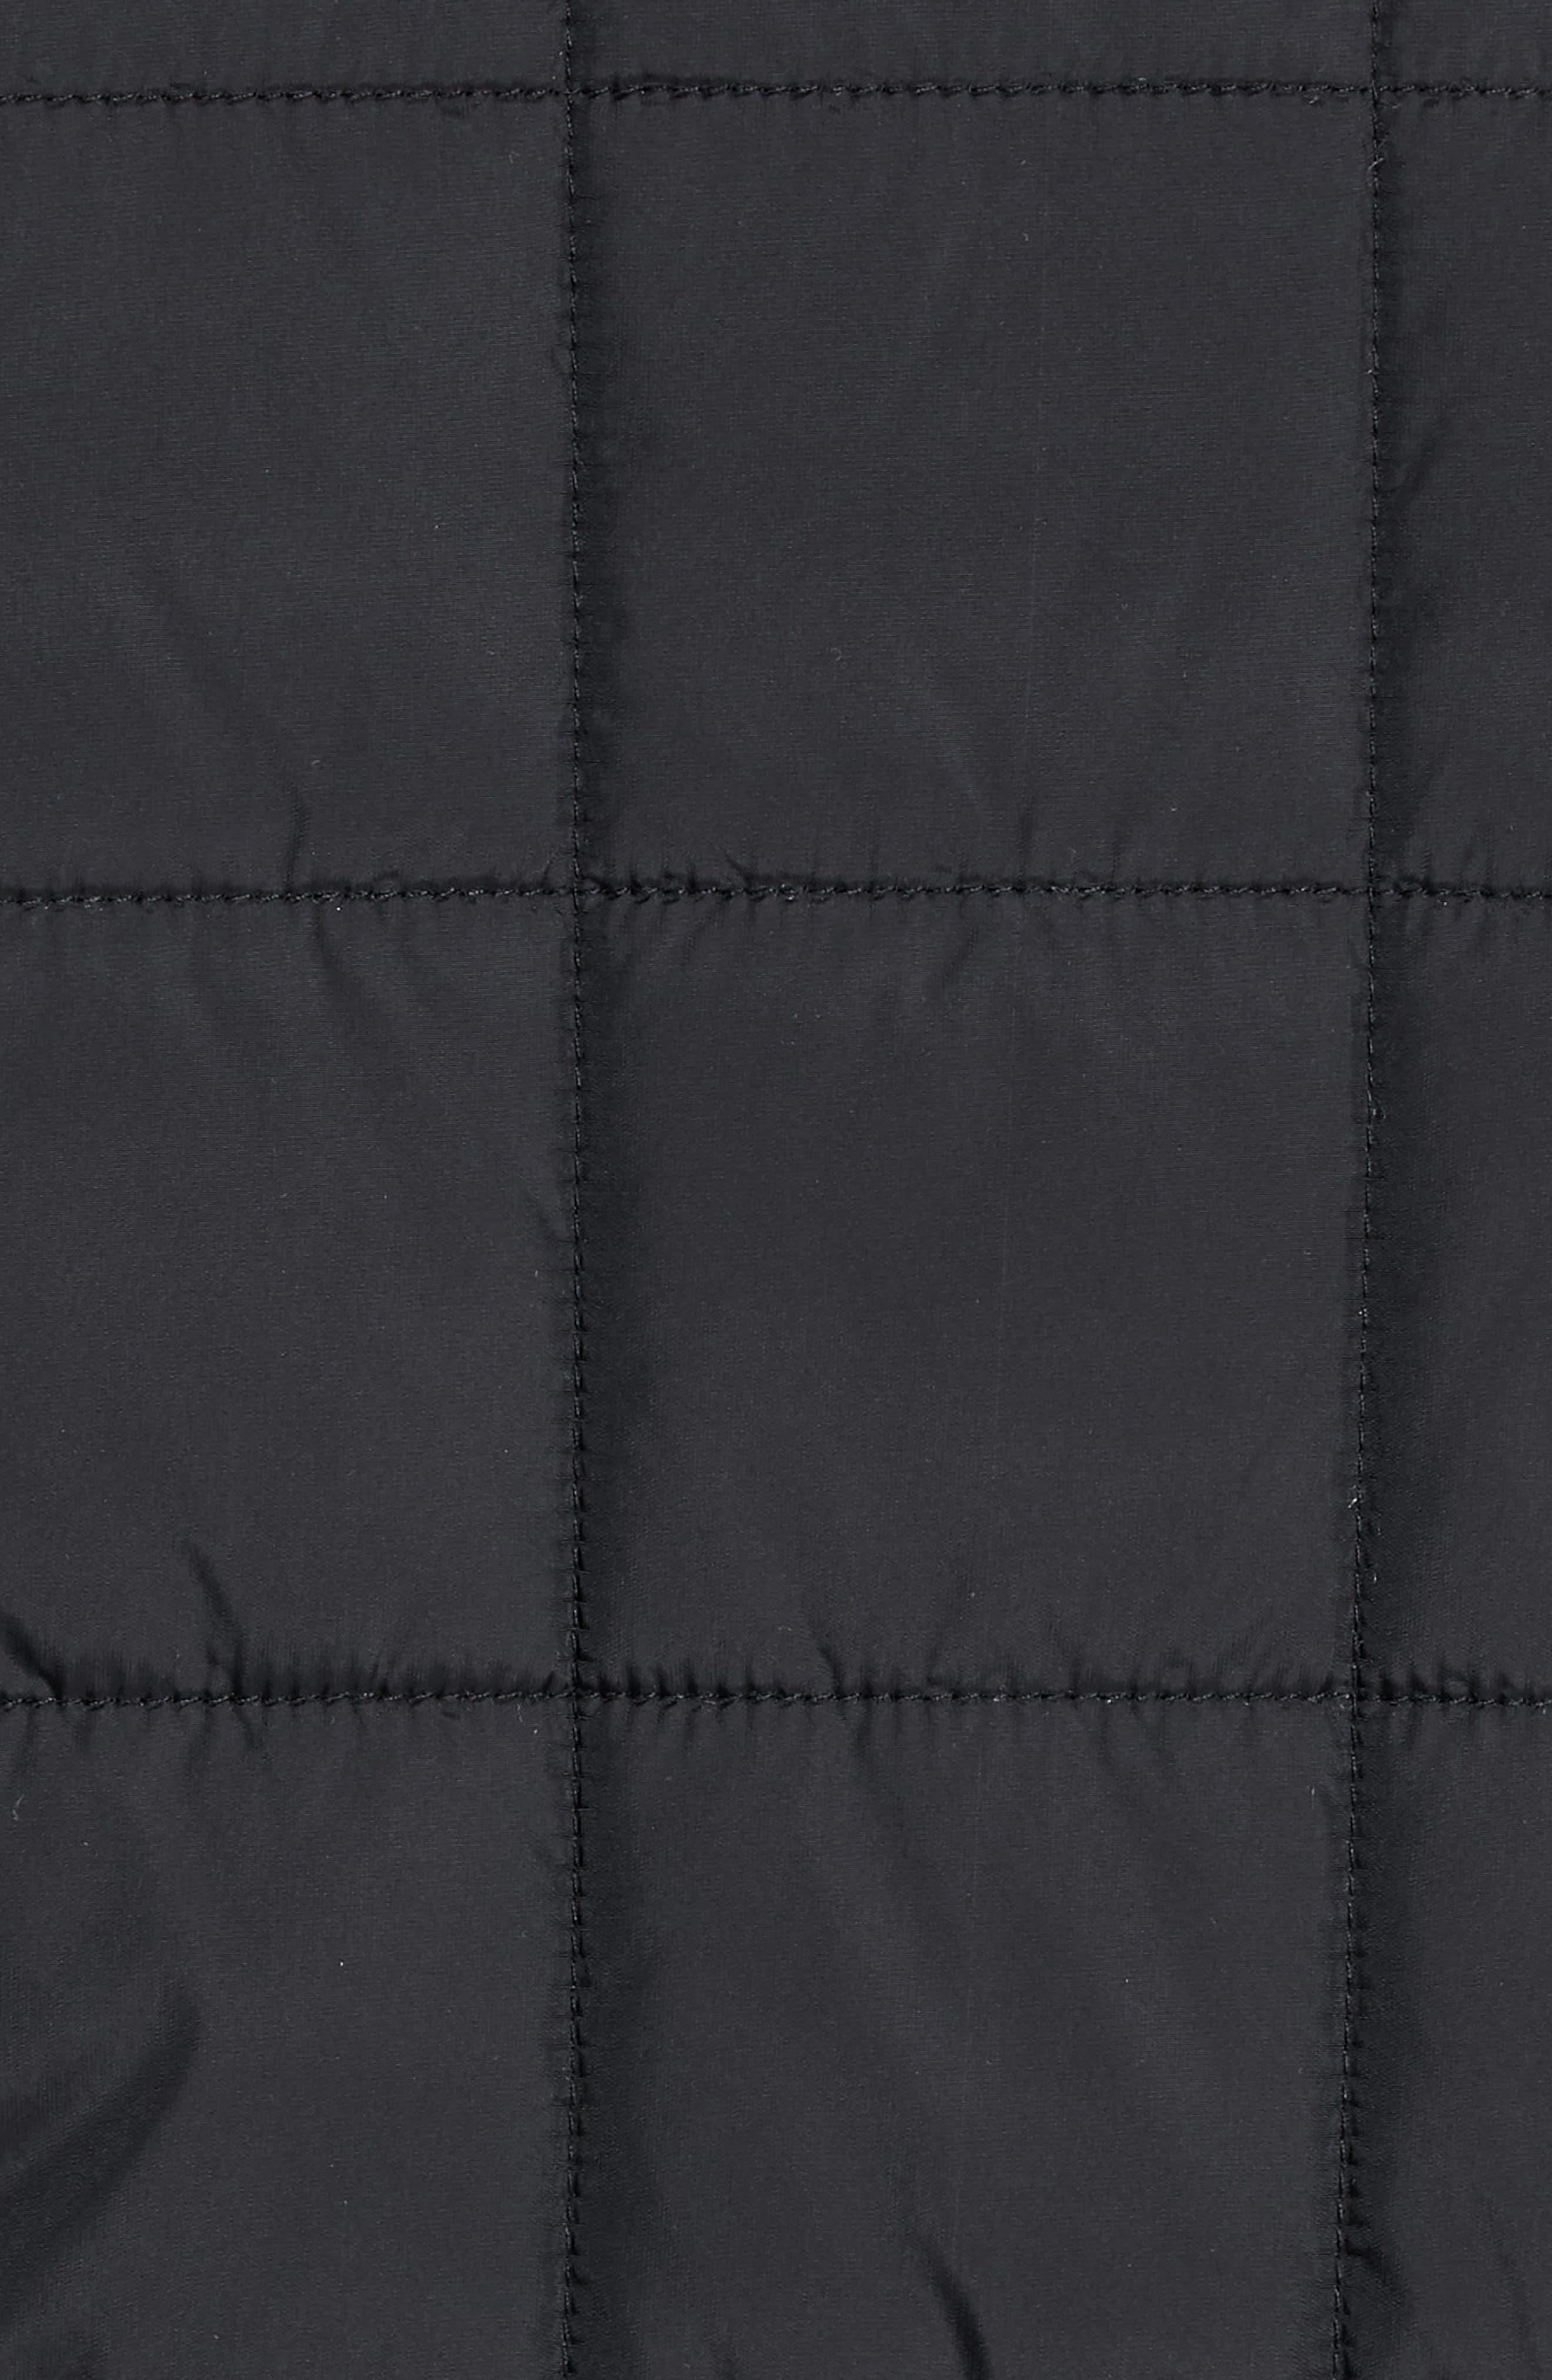 Lesta Quilted Slim Fit Jacket,                             Alternate thumbnail 7, color,                             BLACK